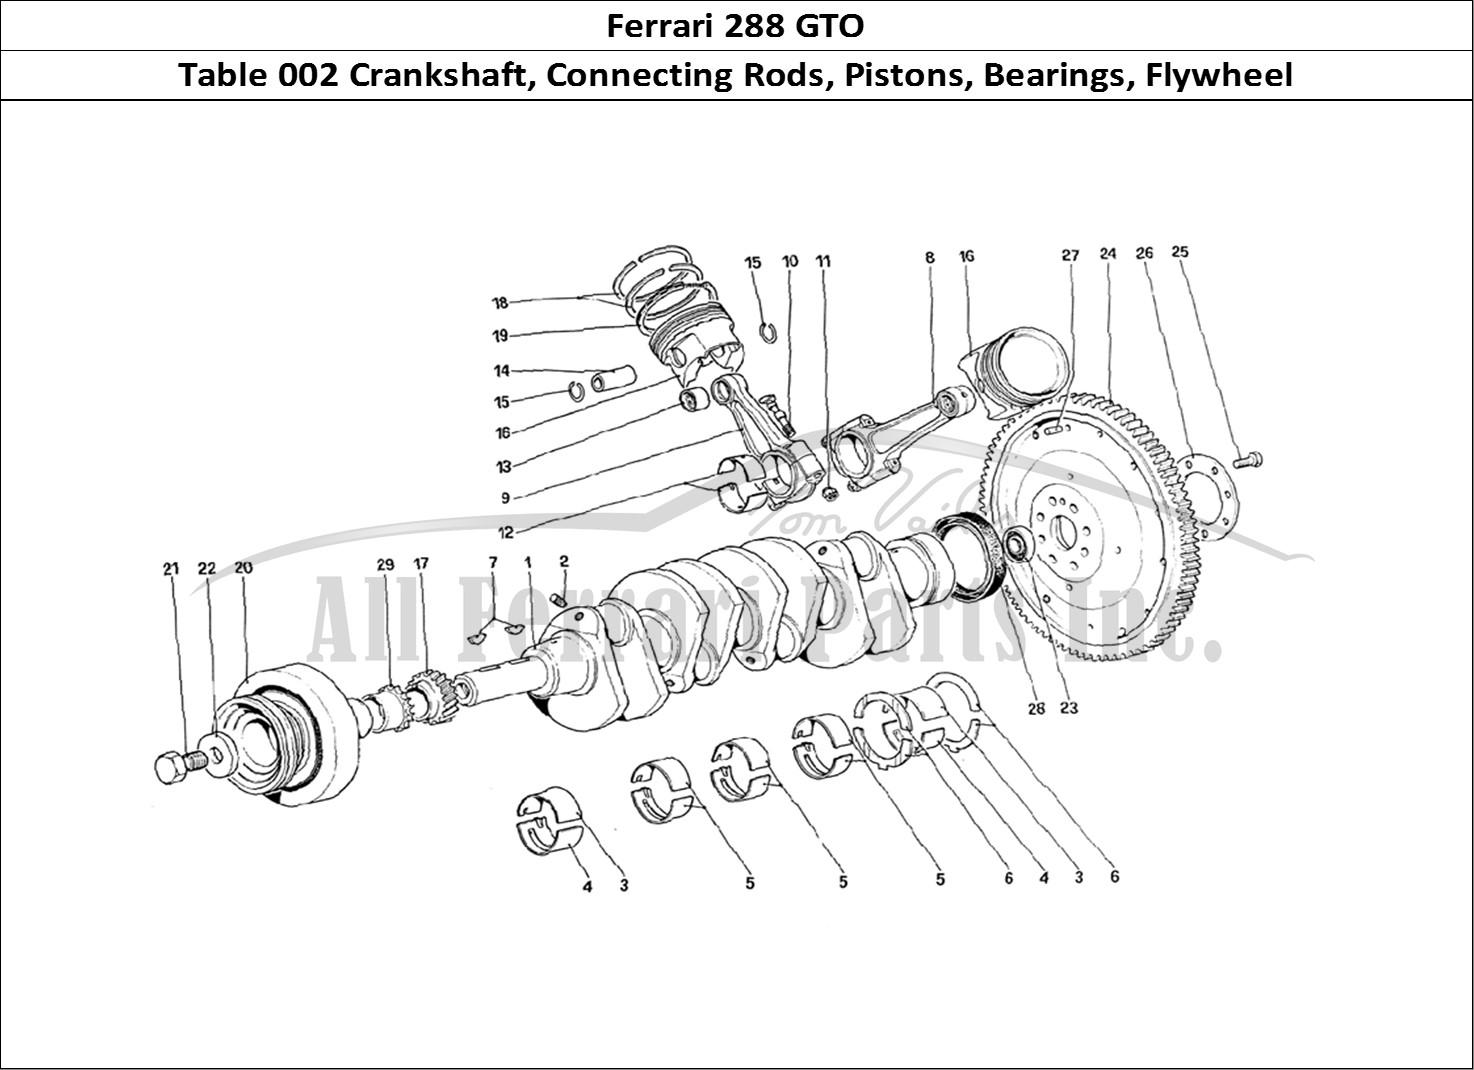 buy original ferrari 288 gto 002 crankshaft  connecting rods  pistons  bearings  flywheel